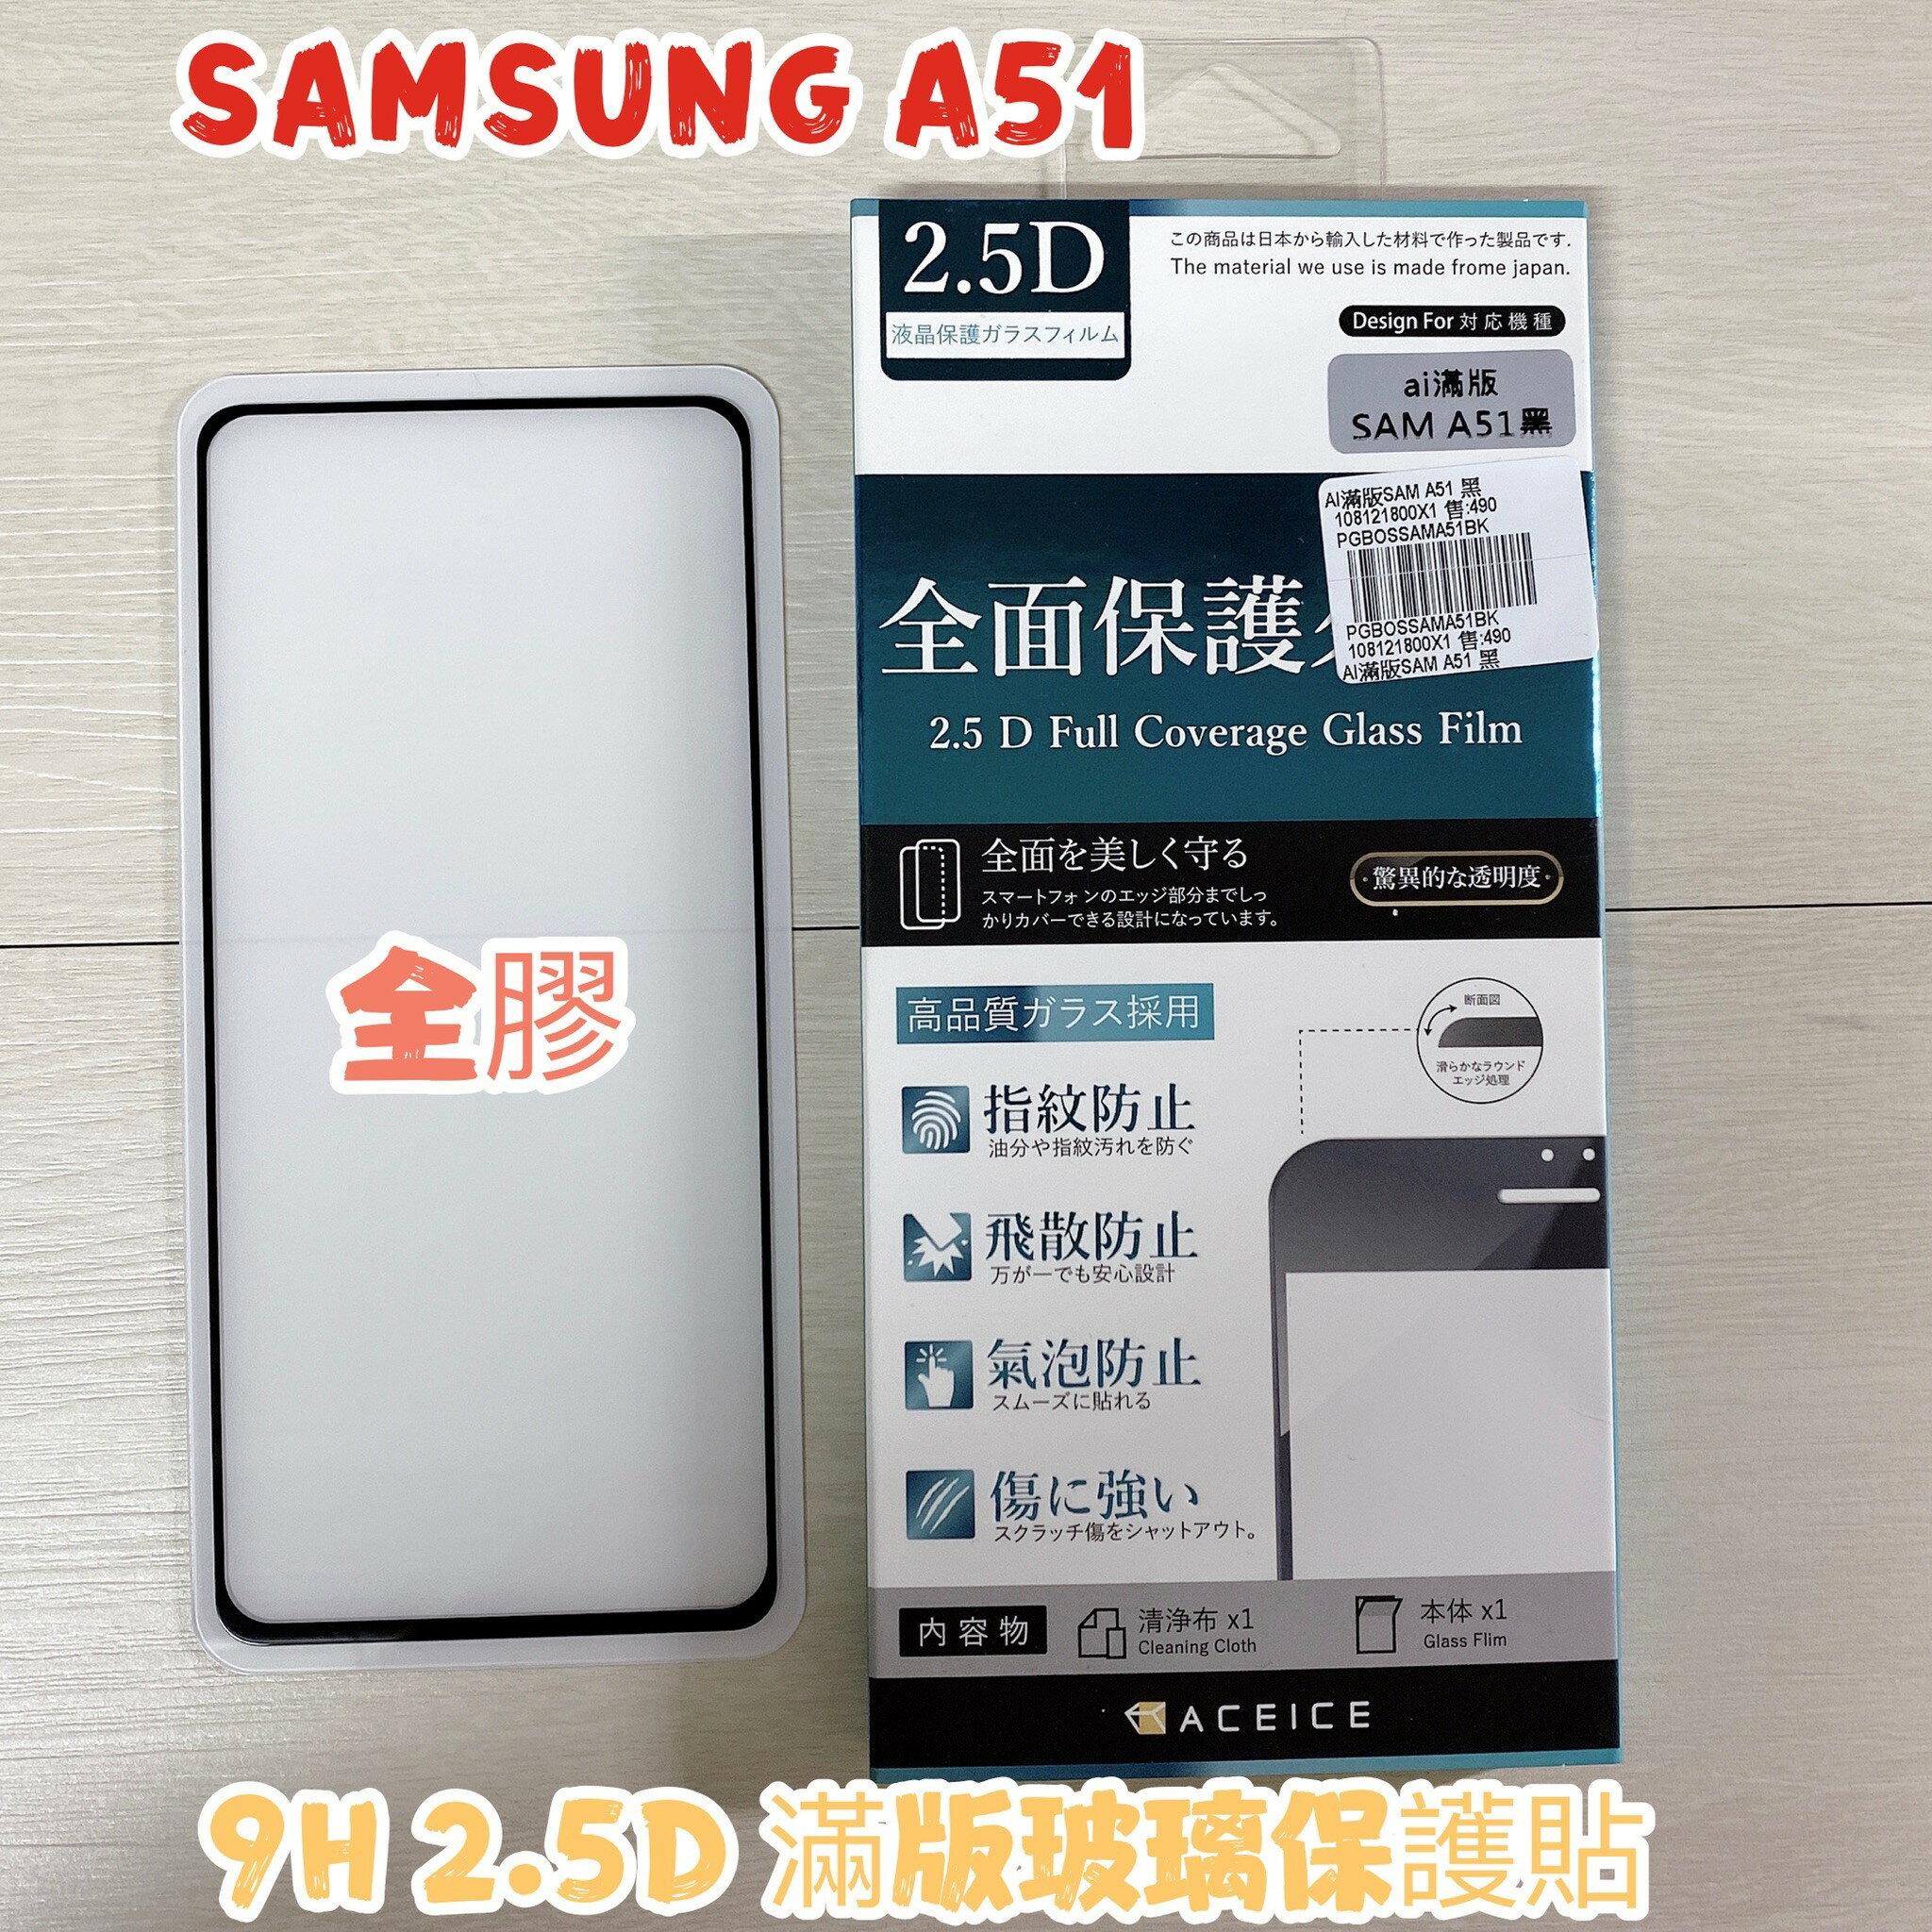 """扛壩子"" SAMSUNG A51 A51 5G 6.5吋 滿版 2.5D AI 9H 鋼化膜玻璃螢幕保護貼"